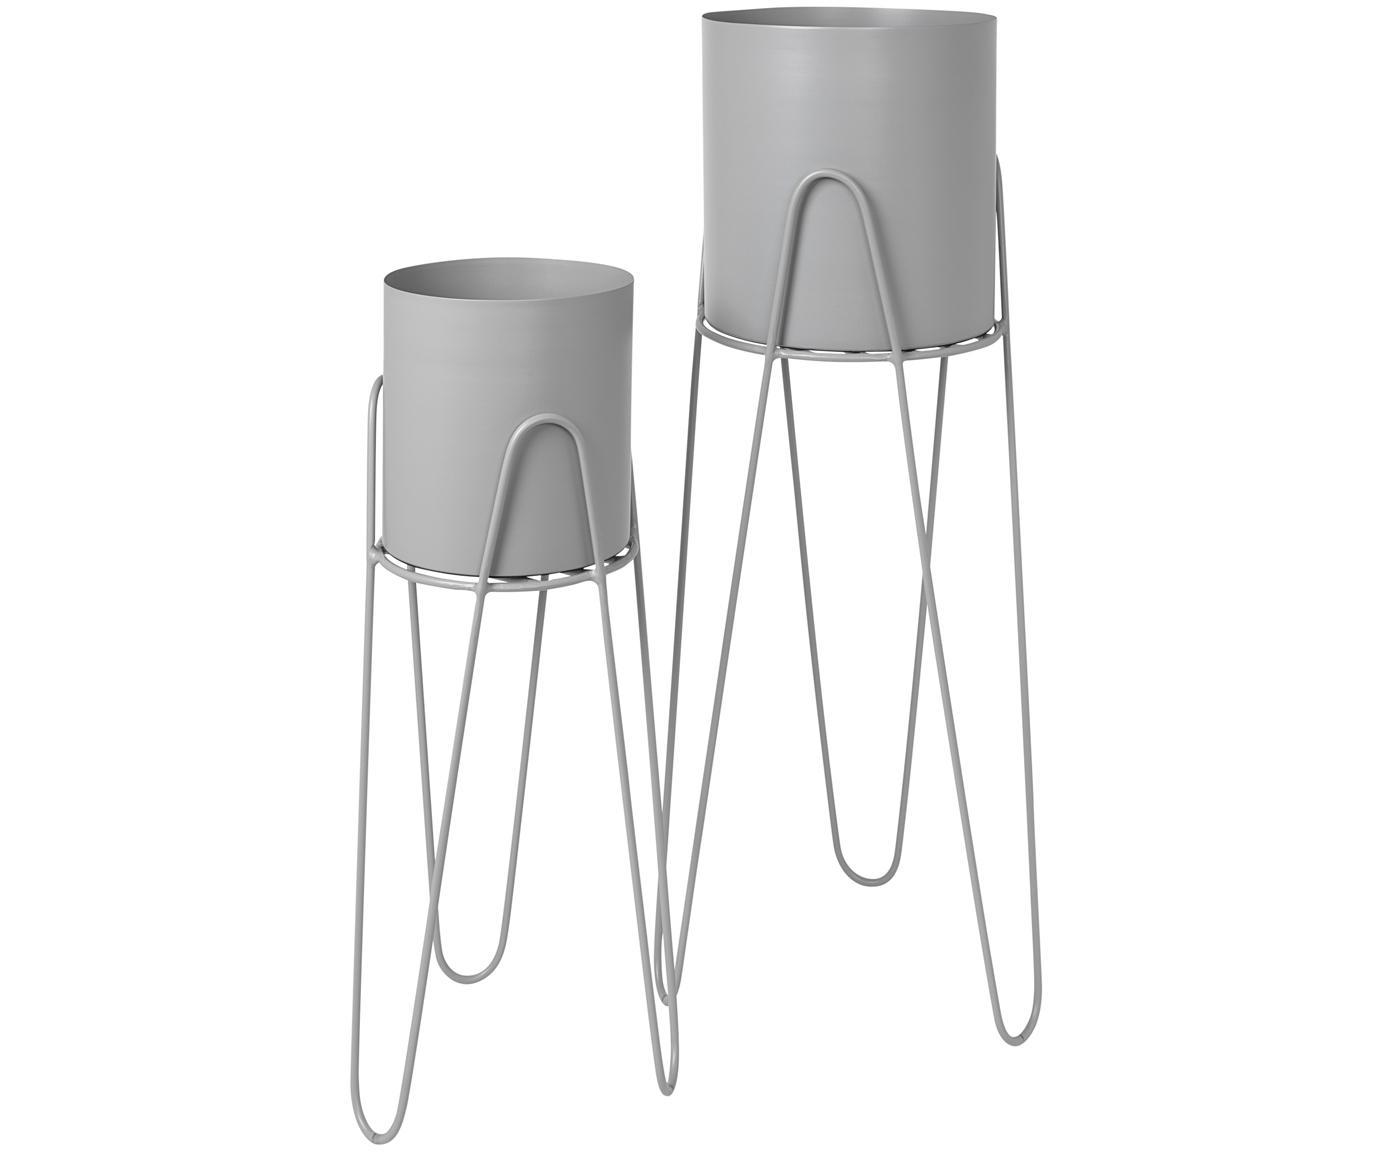 Übertöpfe-Set Lisa, 2-tlg., Metall, Hellgrau, Sondergrößen